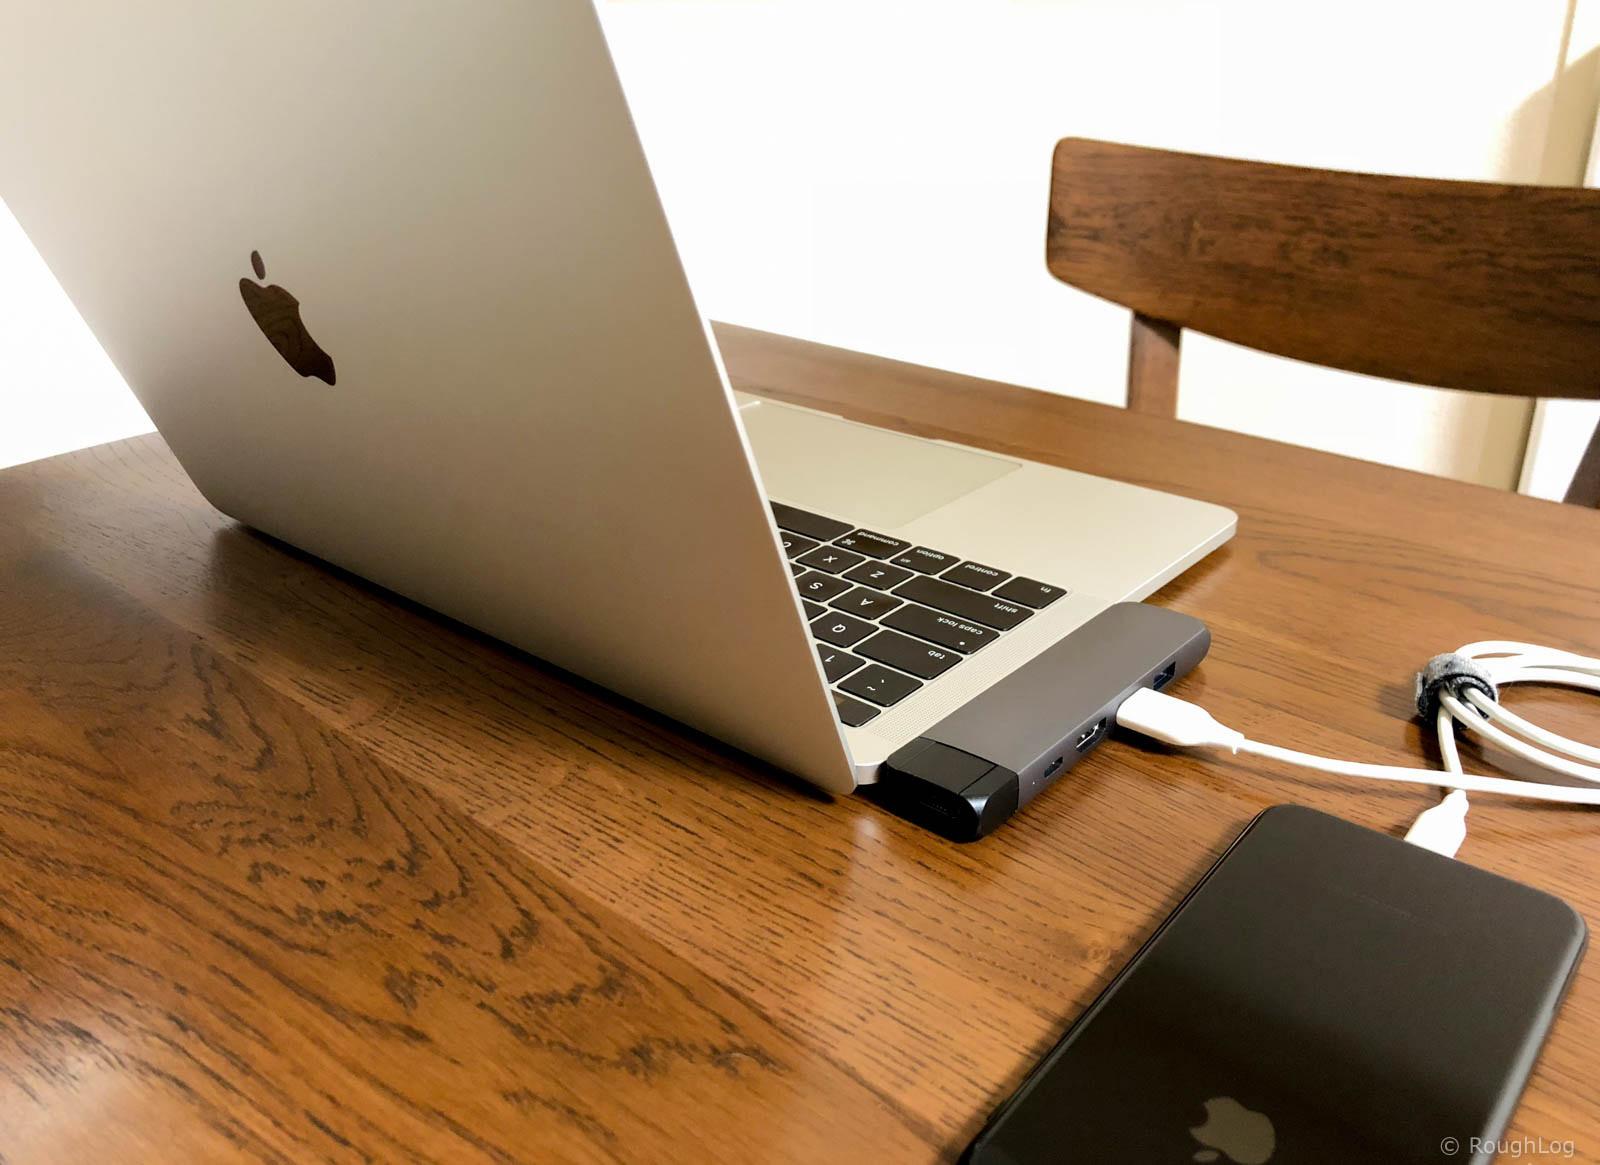 Satechi USB-C Pro ハブを使ってMacBook ProとiPhoneを接続